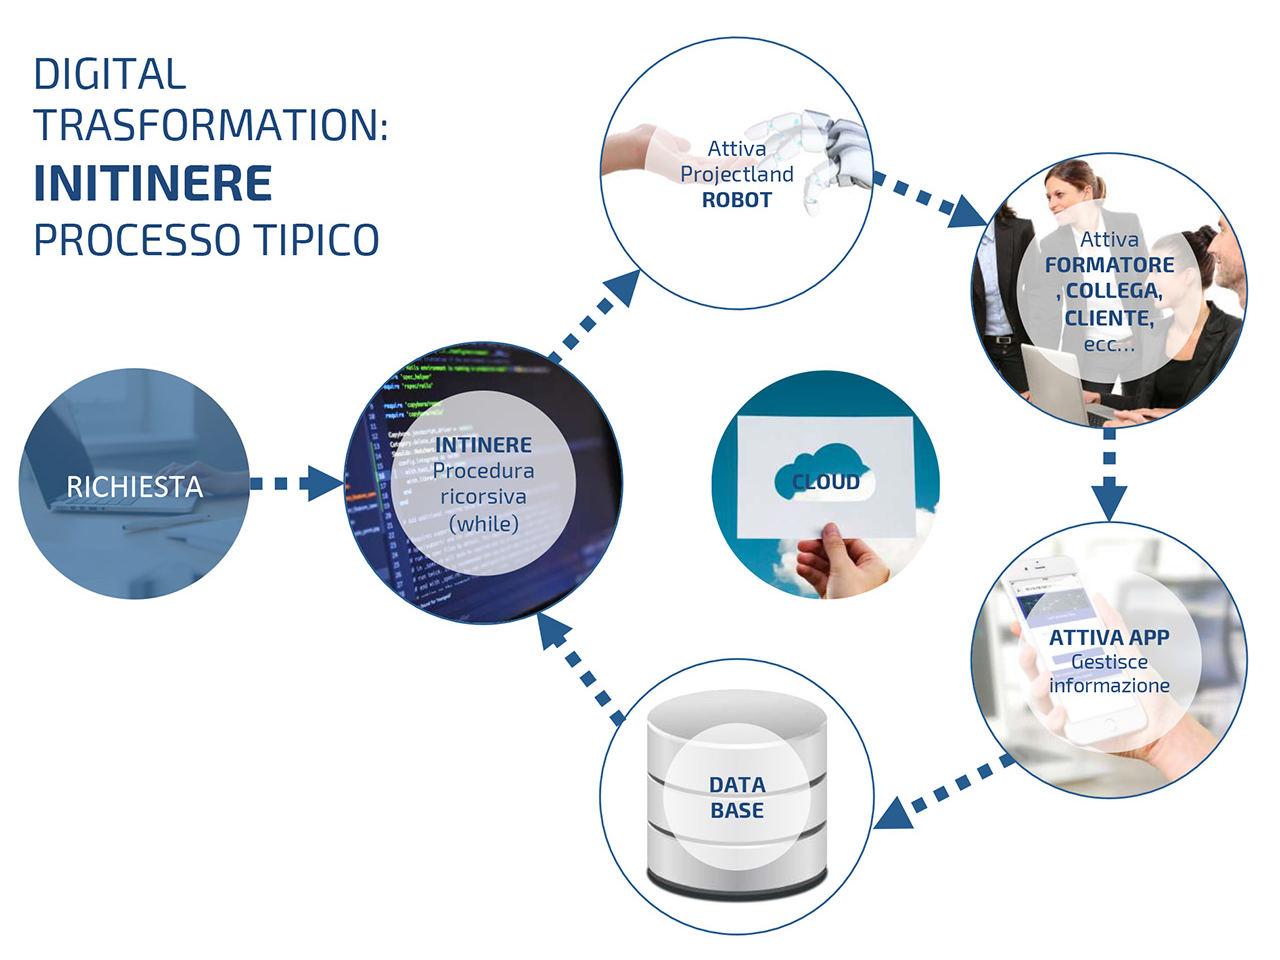 Processo Digital Transformation Initinere